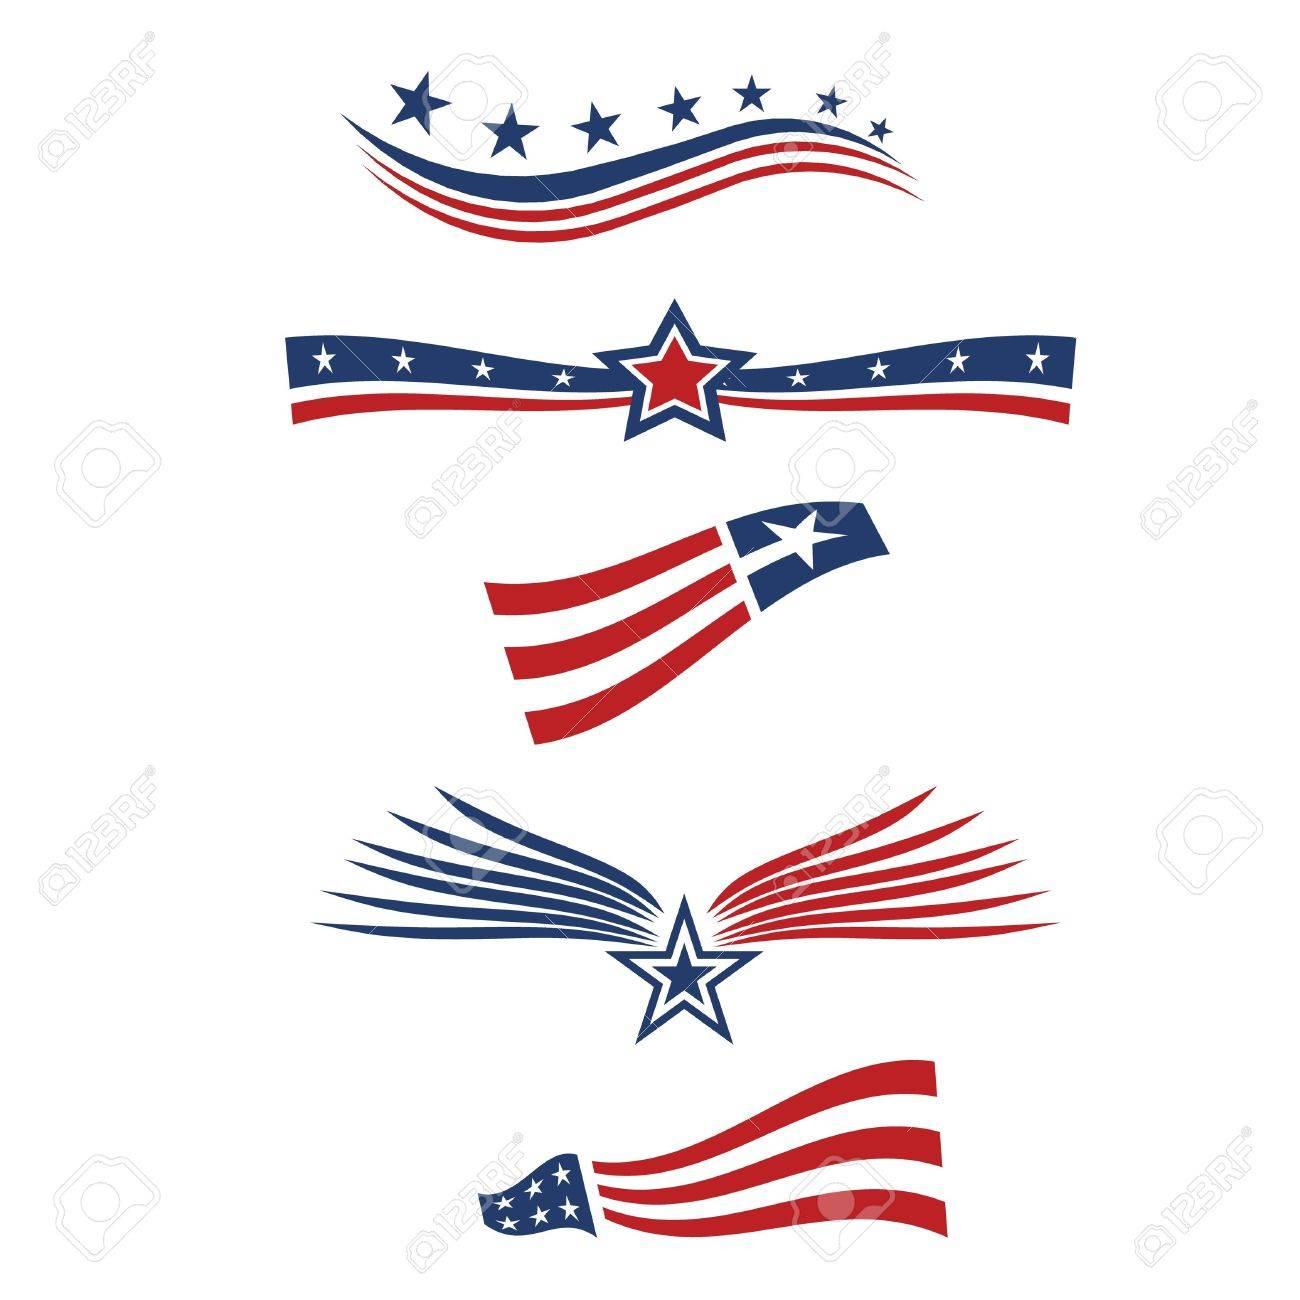 USA star flag design elements - 21953833